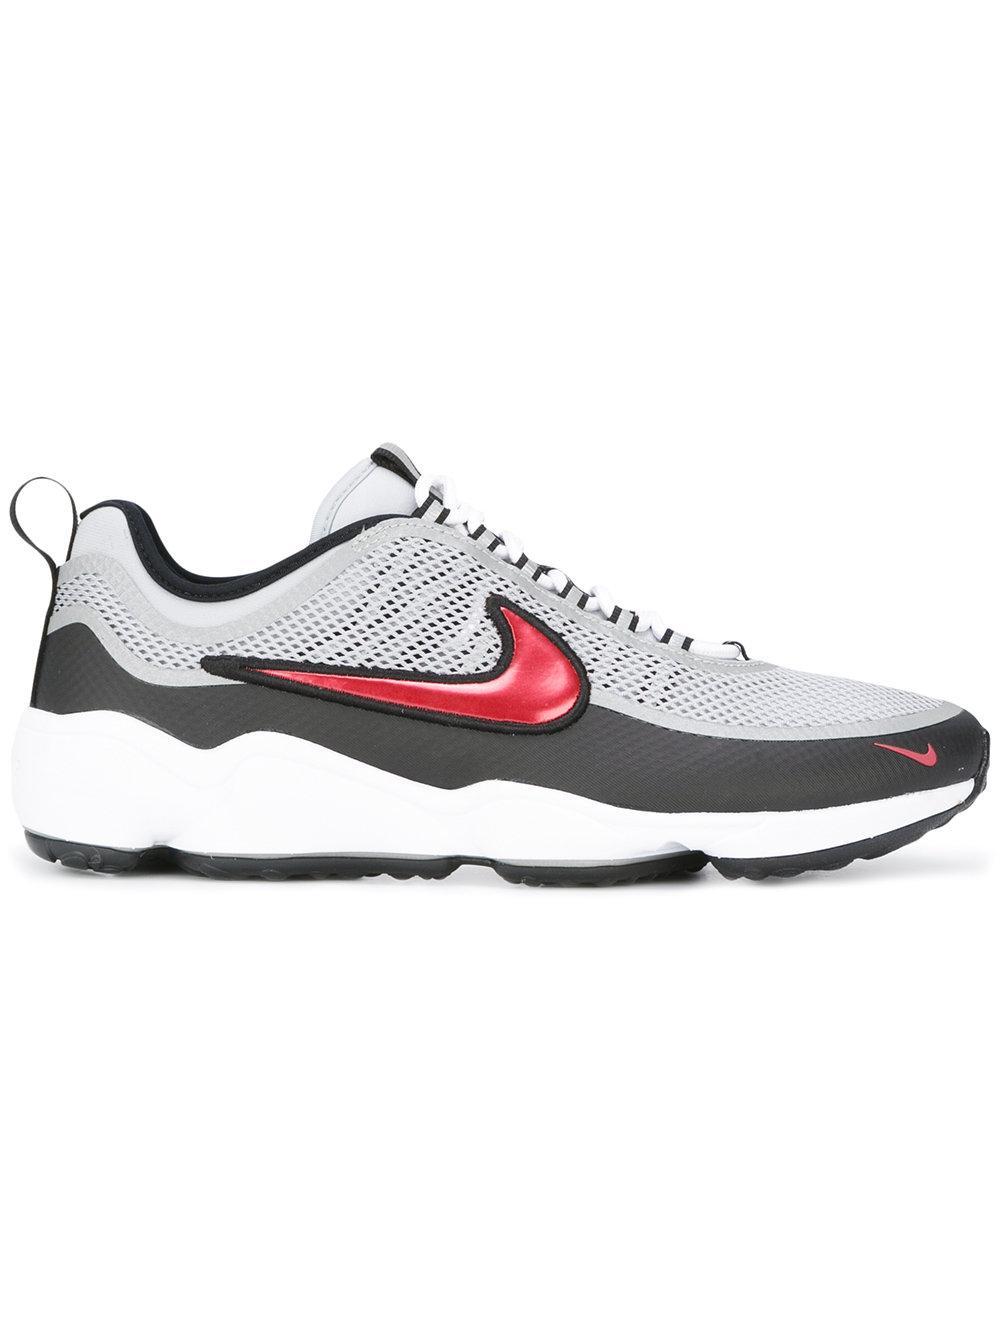 c731b61a34f Nike Air Zoom Spiridon Ultra Sneakers - Grey